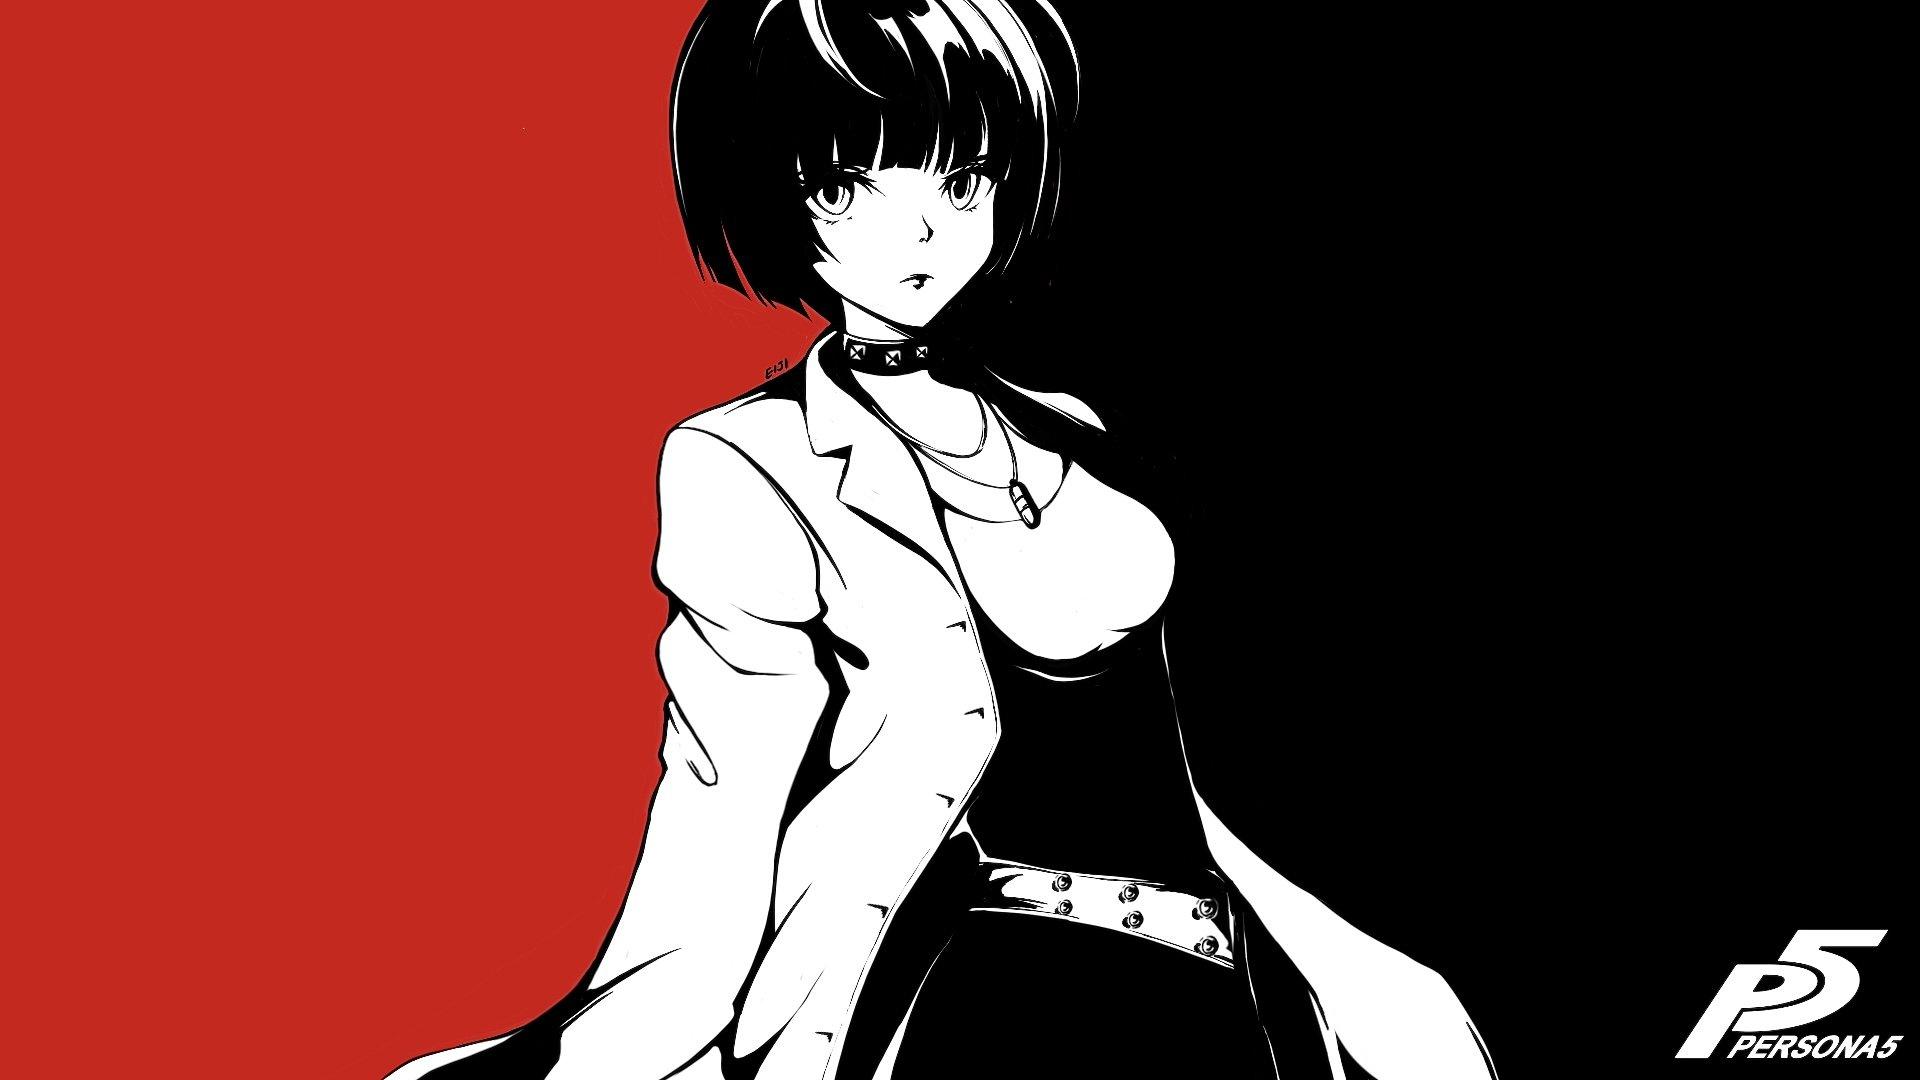 Takemi-Tae-Persona-5-Persona-Игры-6422880.jpeg - Persona 5